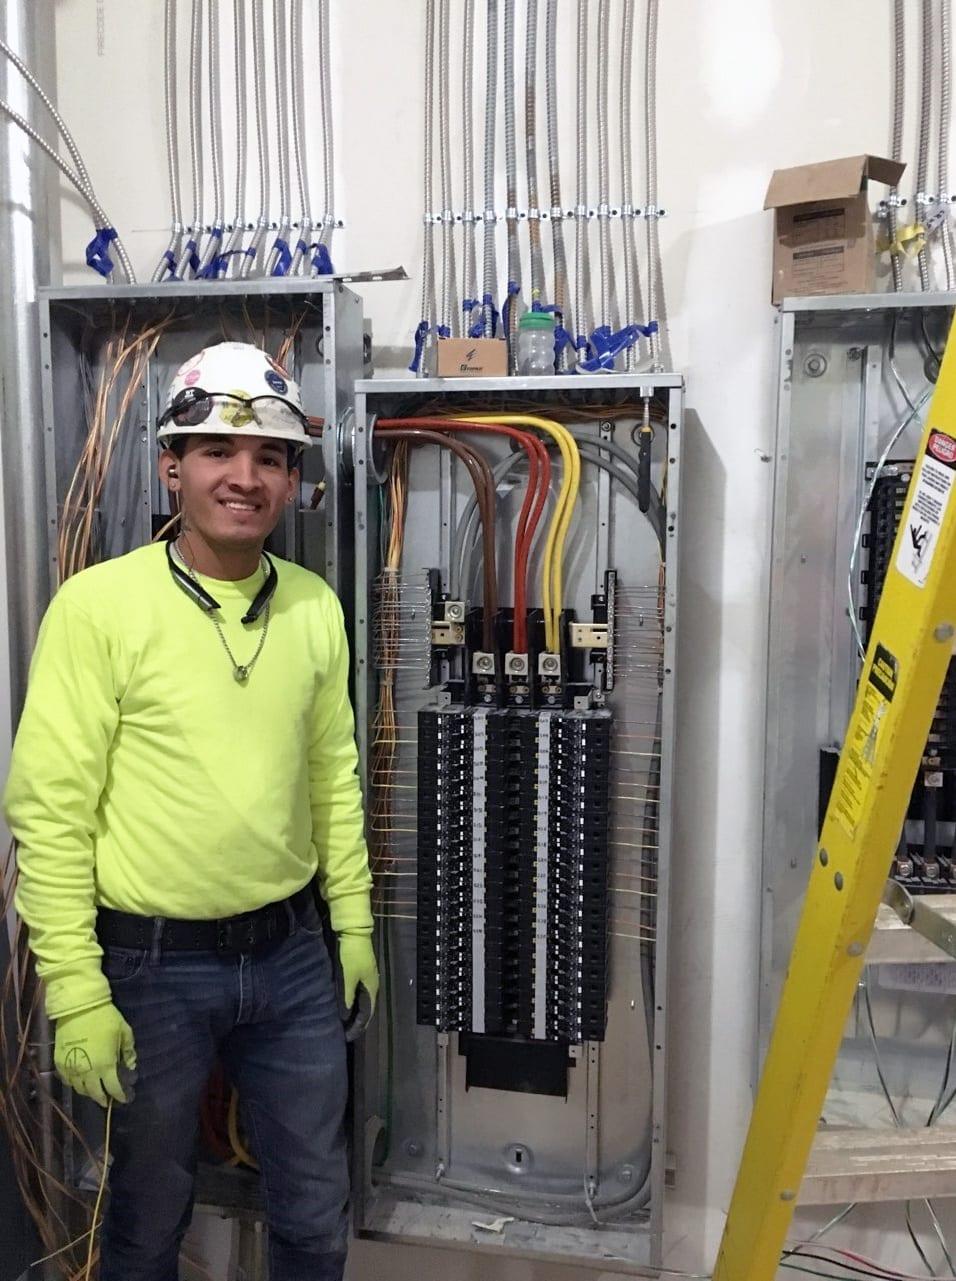 bates electrician